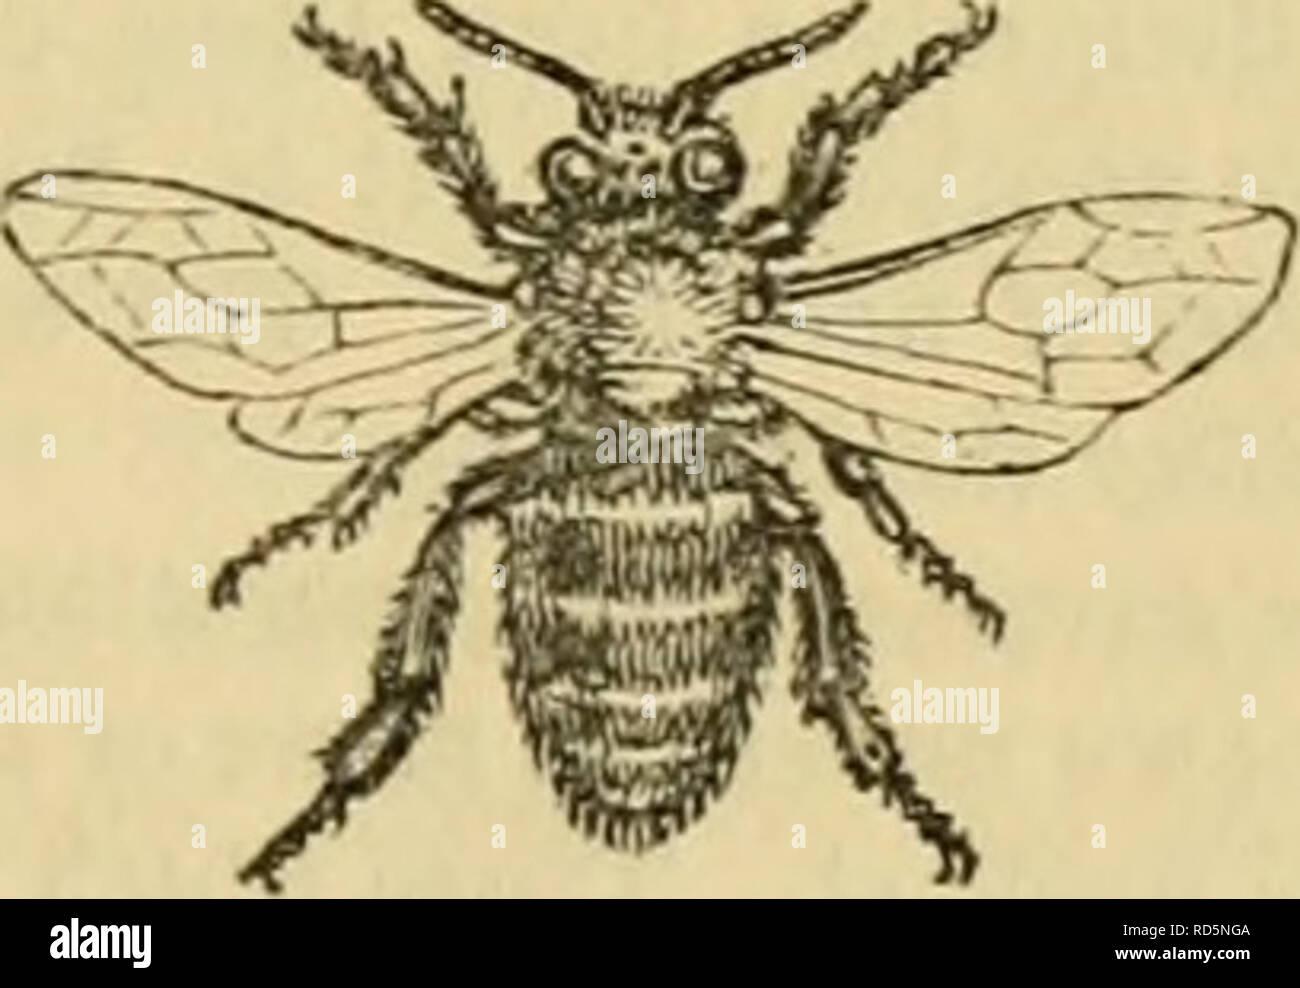 Cuvier S Animal Kingdom Arranged According To Its